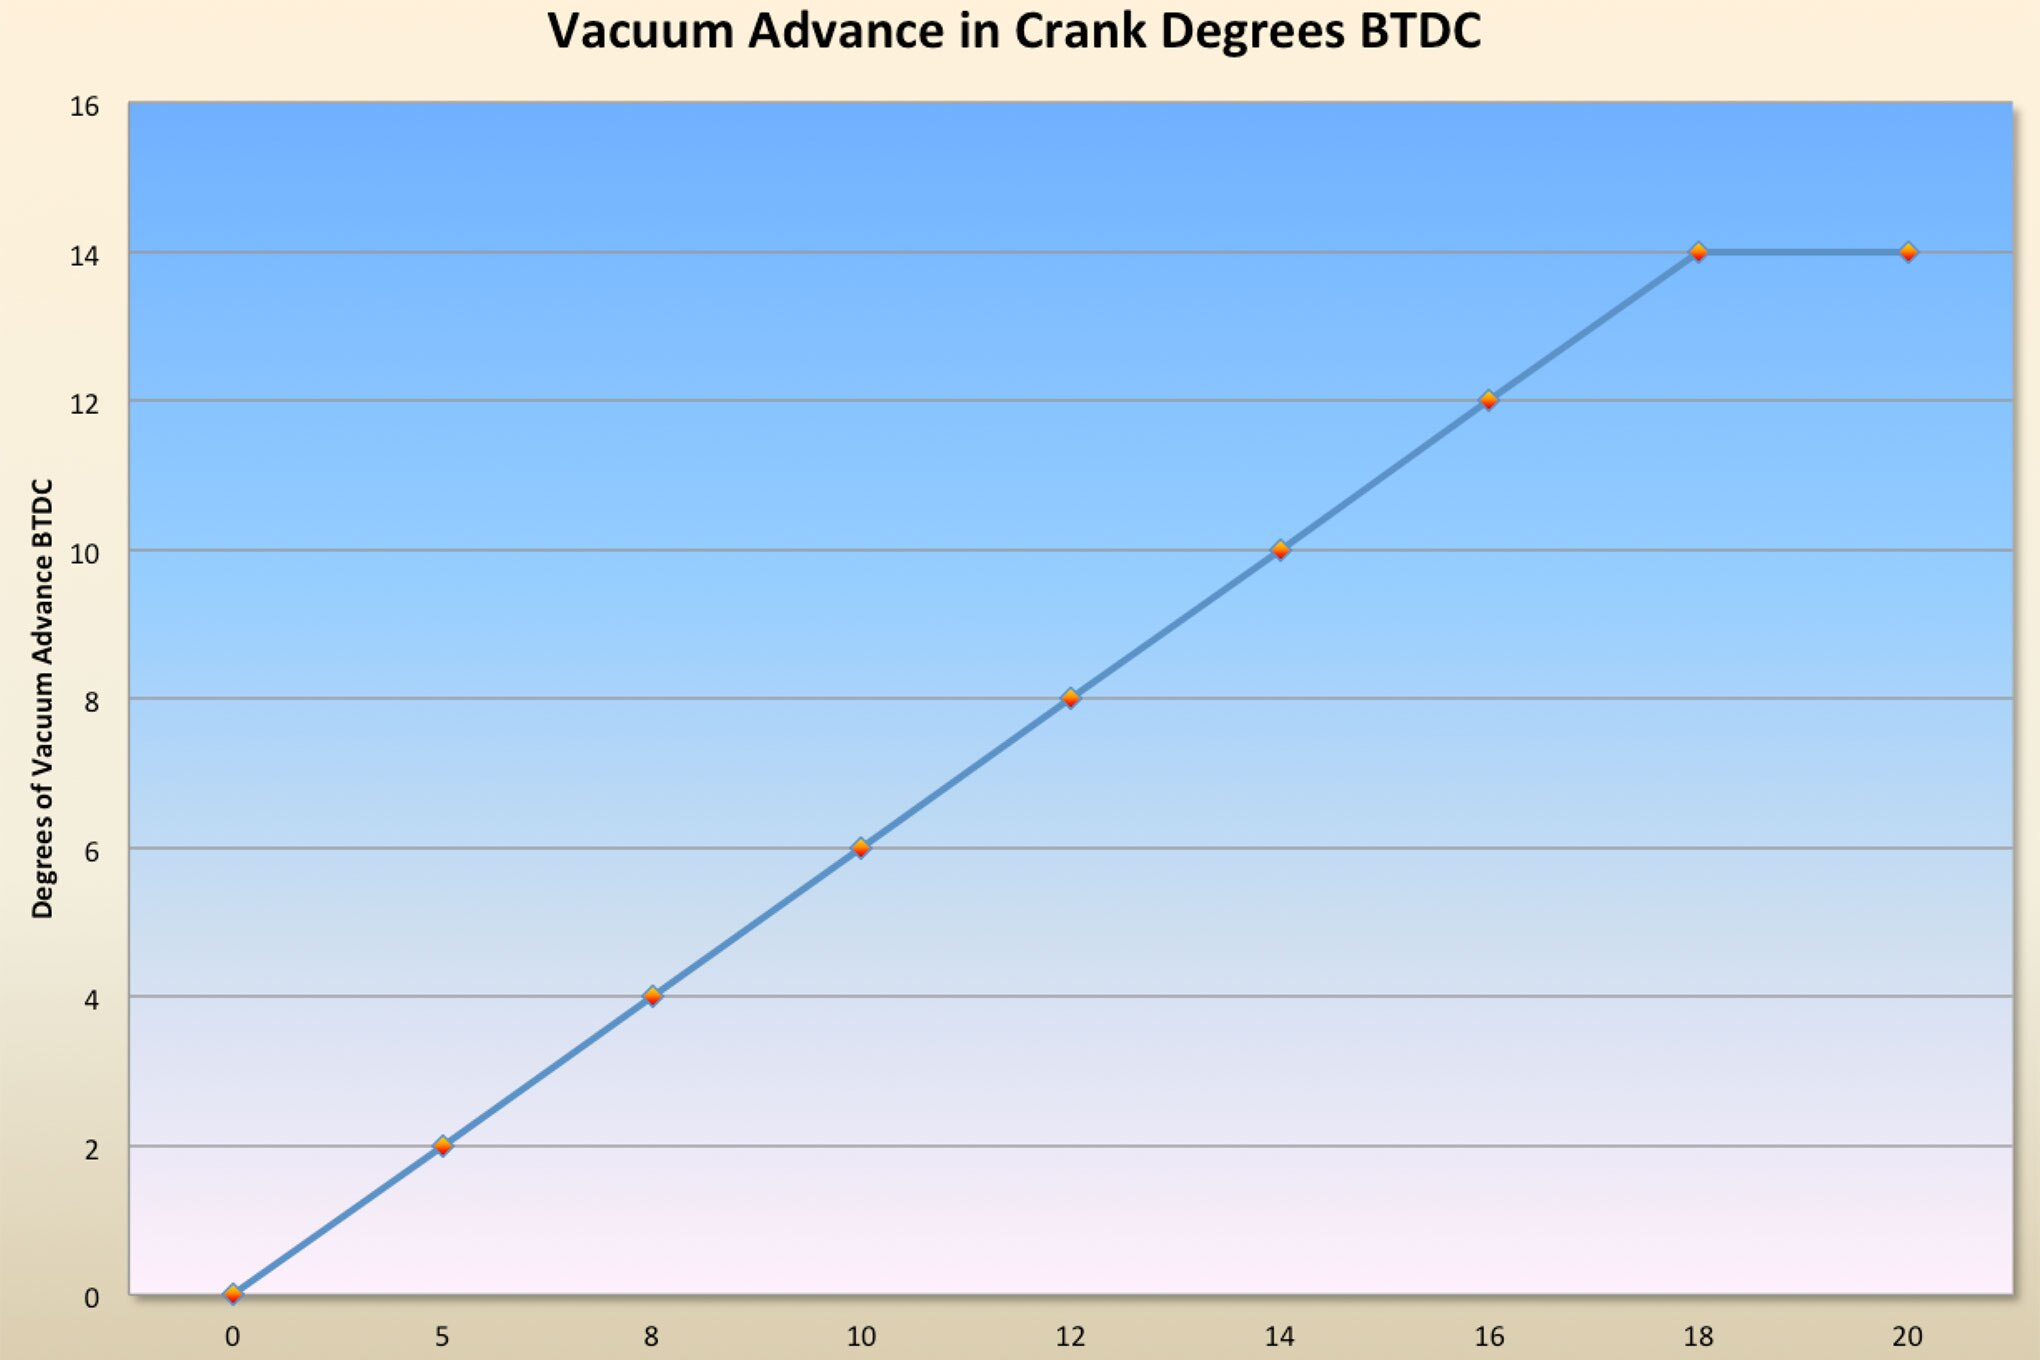 tc1 heater wiring diagram wiring diagram source 3 phase heater wiring diagram tc1 heater wiring diagram [ 2040 x 1360 Pixel ]